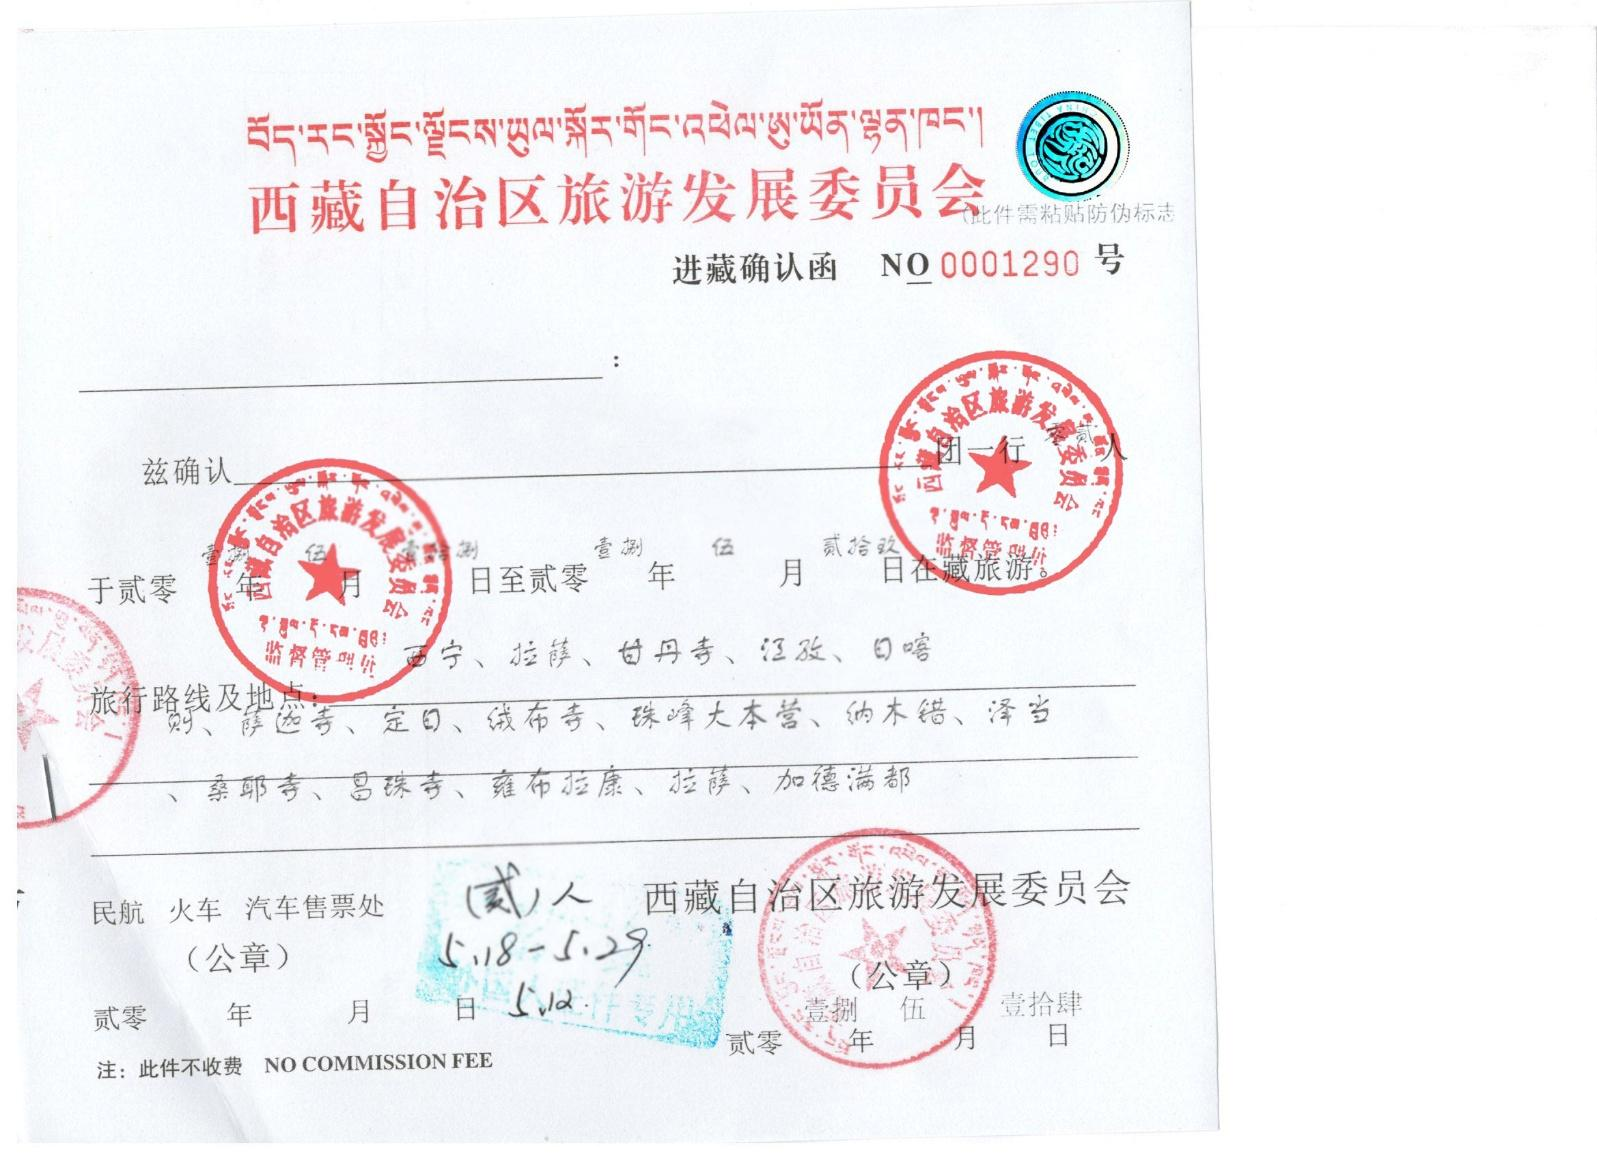 C:\Users\ju\Desktop\tibet travel permit.jpg